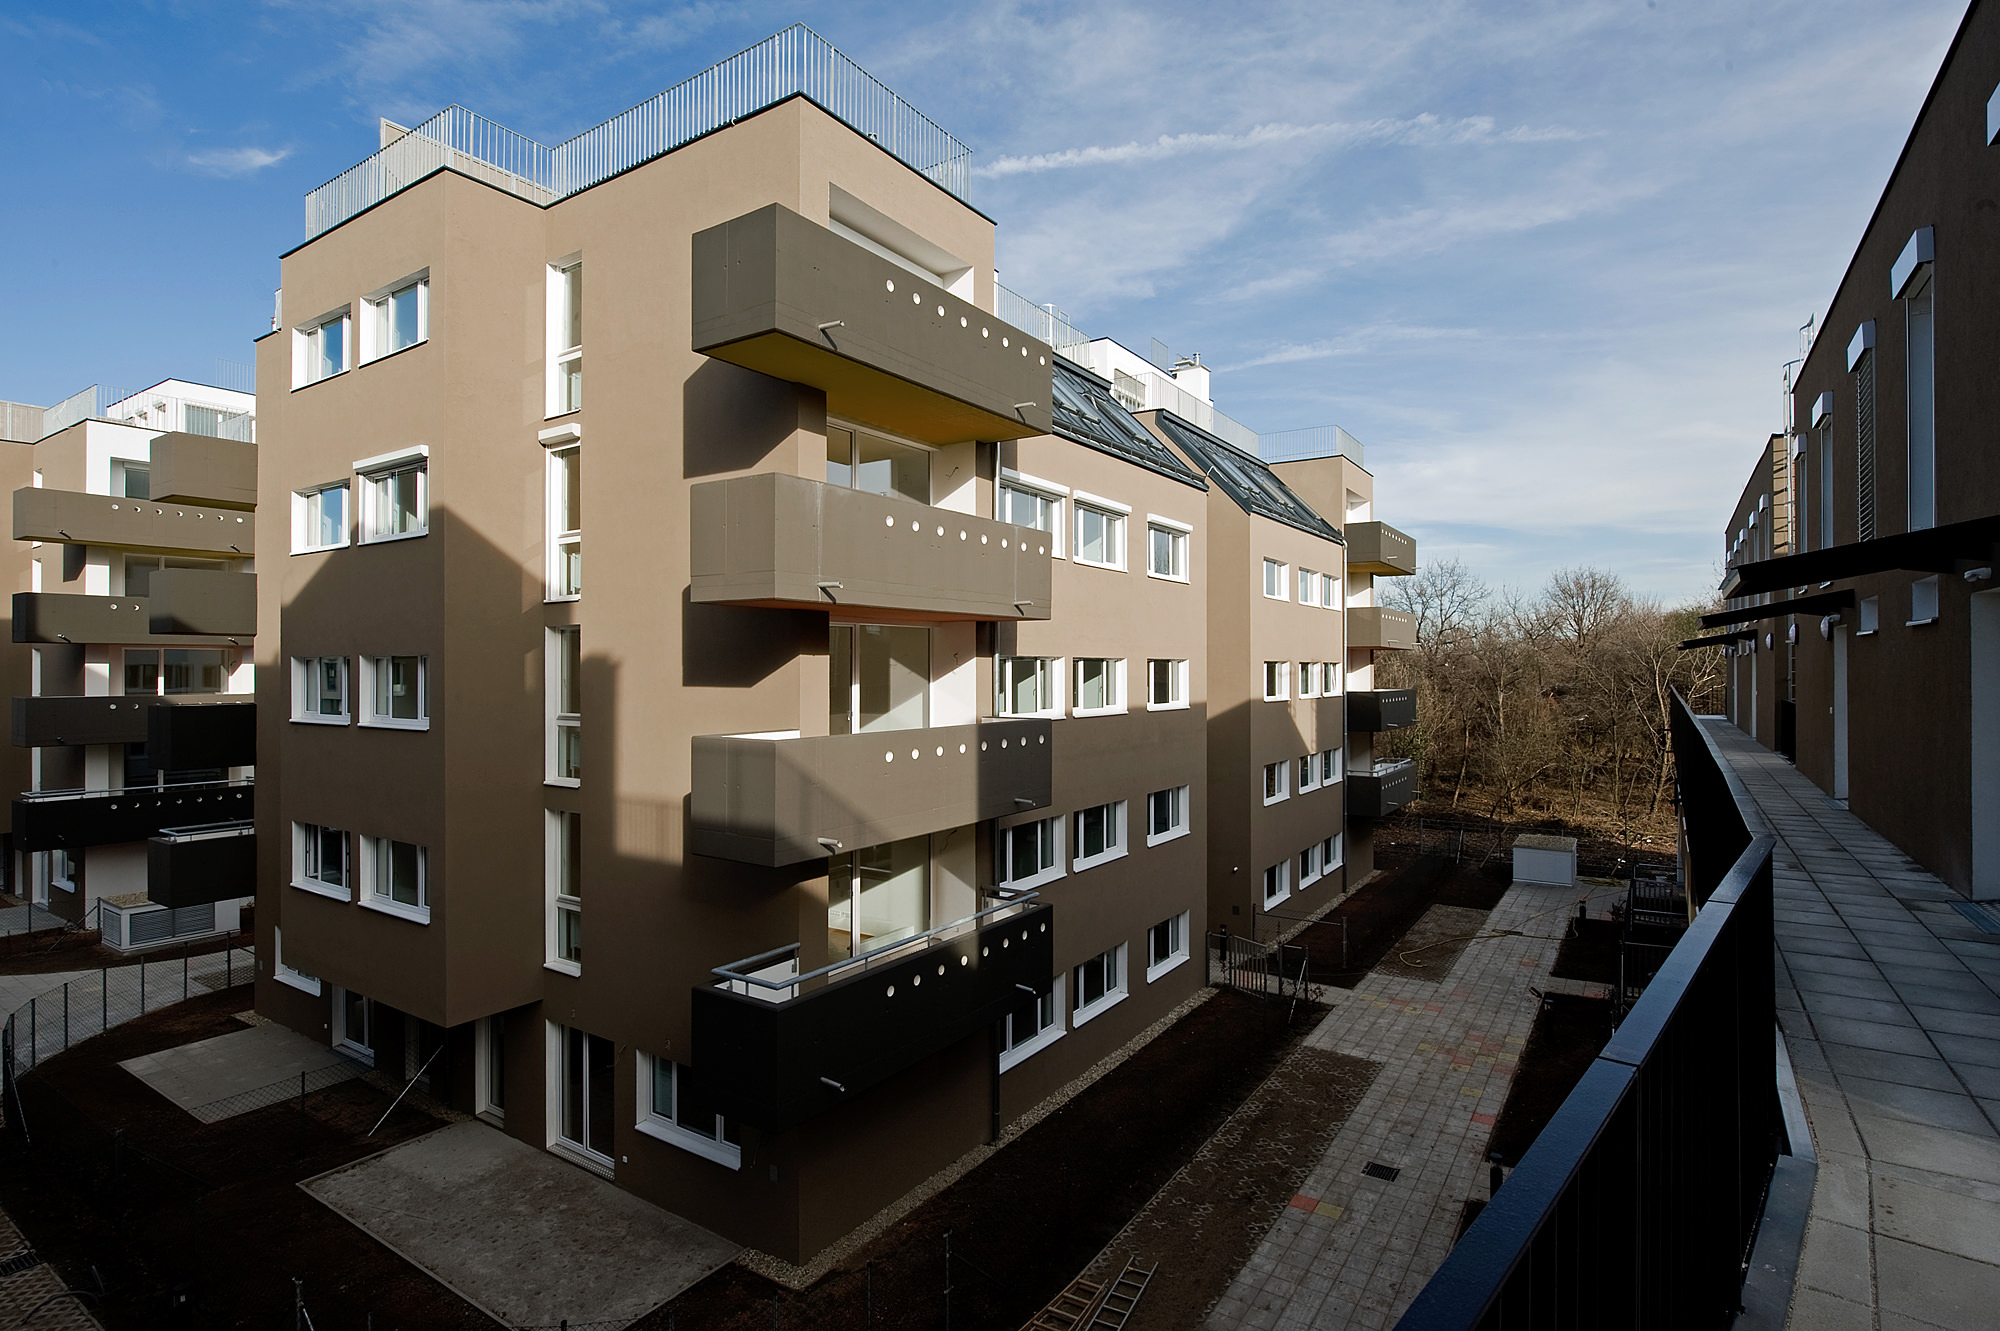 moselgasse_03_wohnbau_1100_wien_junger_beer_architektur